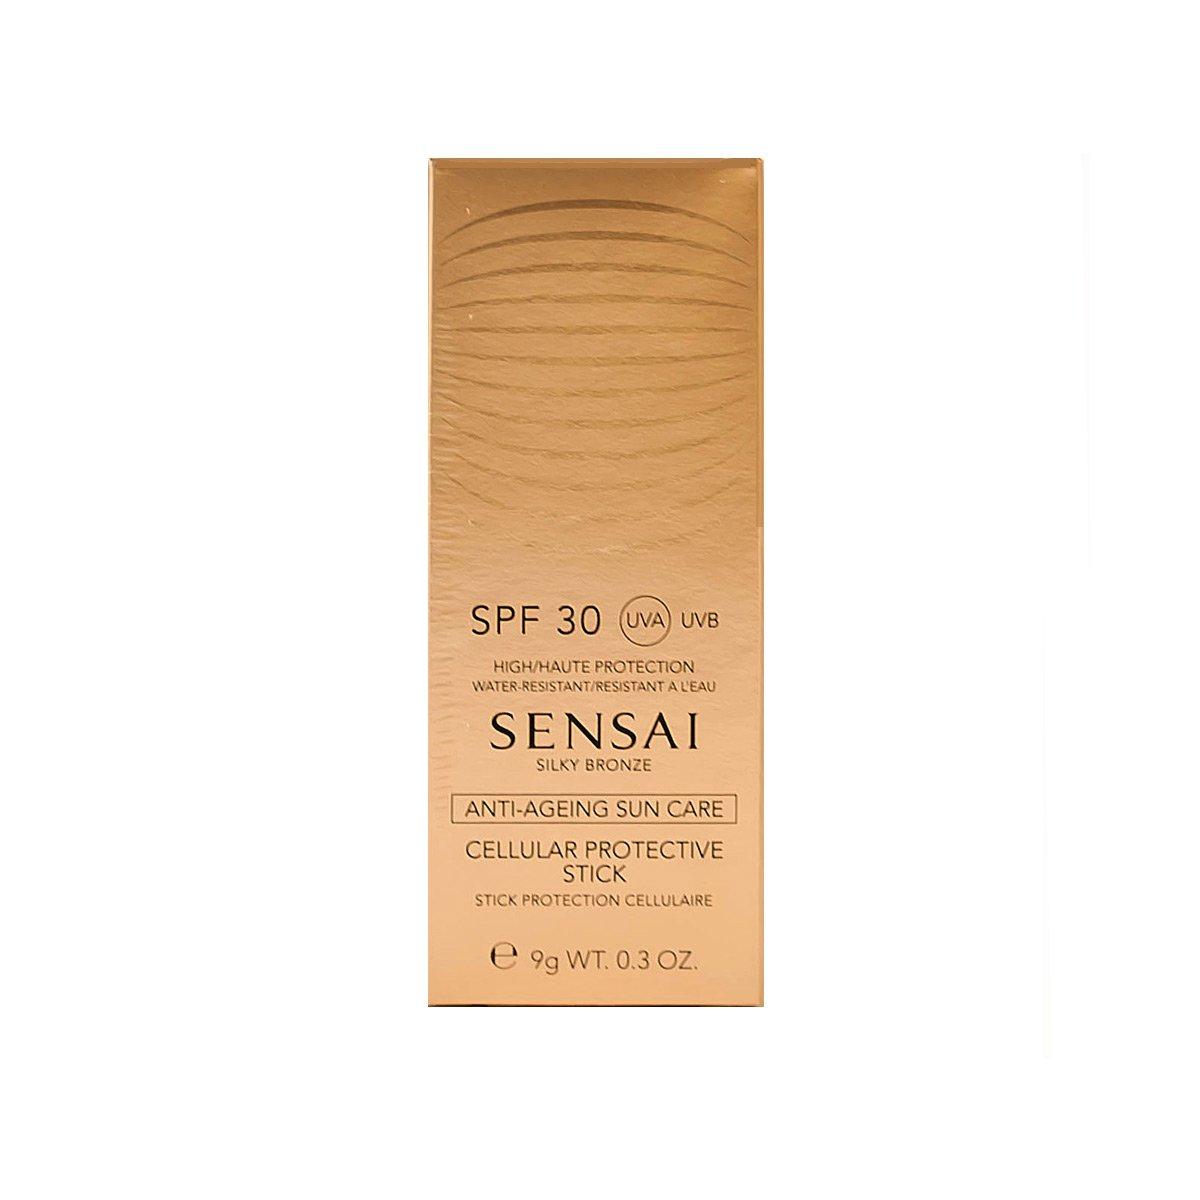 Sensai Cellular Protective Stick with SPF 30, Silky Bronze 9 g Kanebo 4973167954386 45753_-9gr